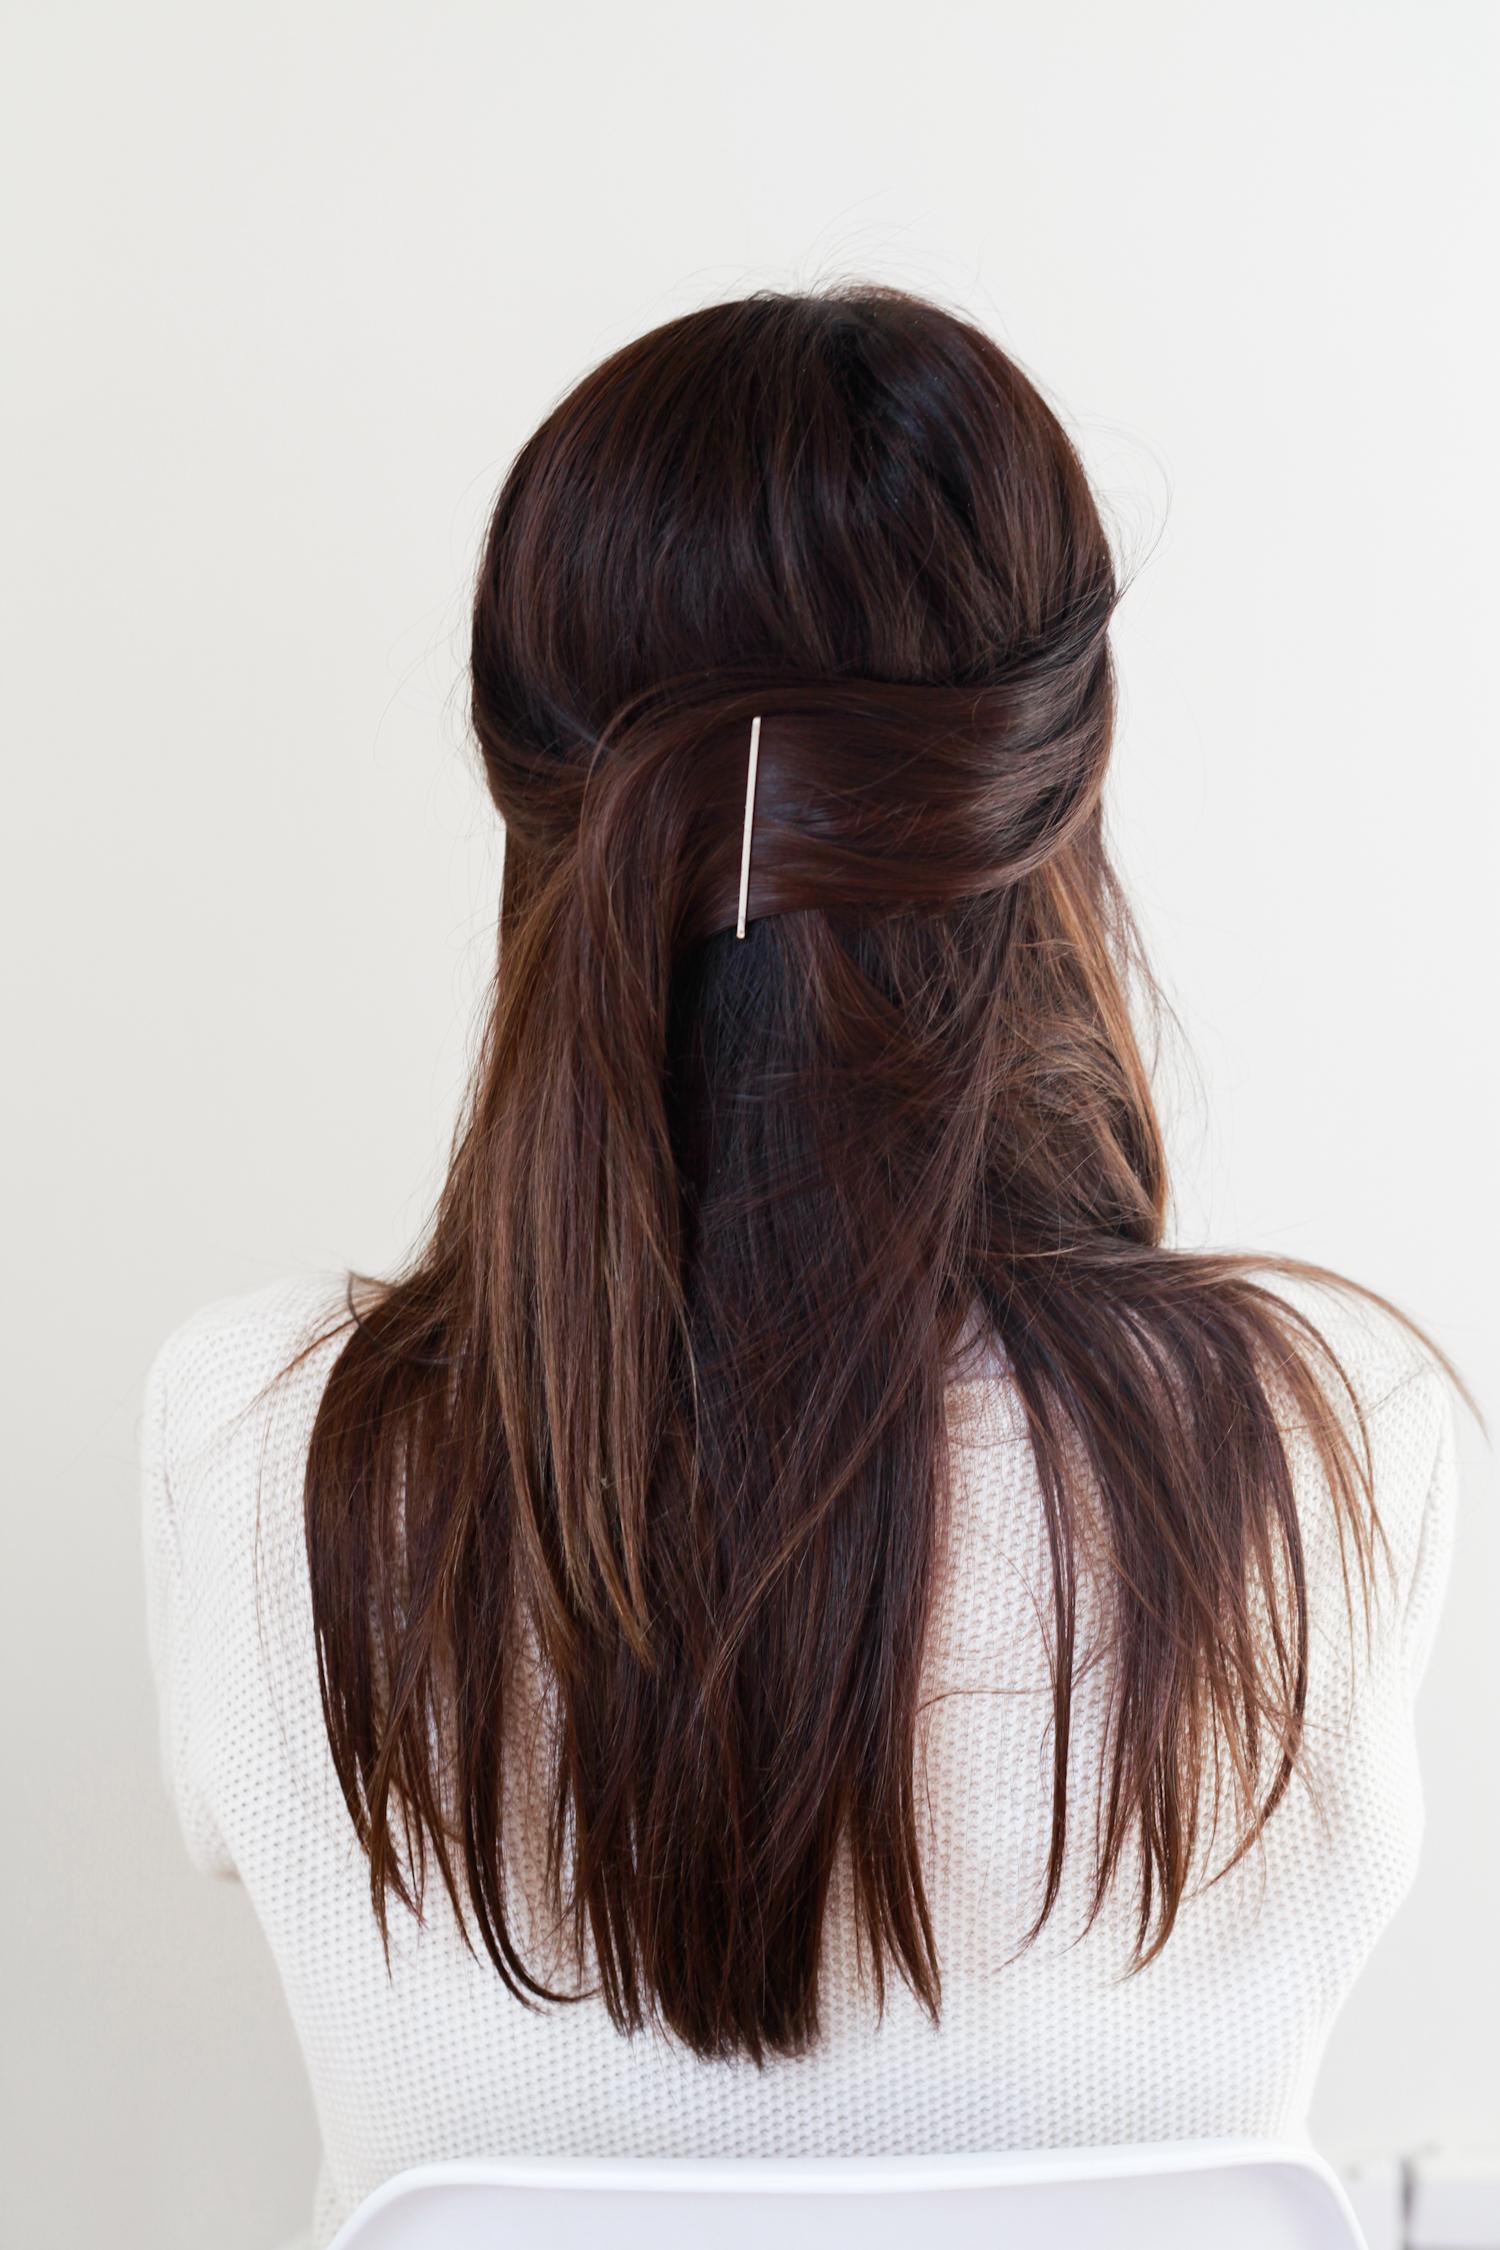 hair tutorial hafl up bobby pin.jpeg